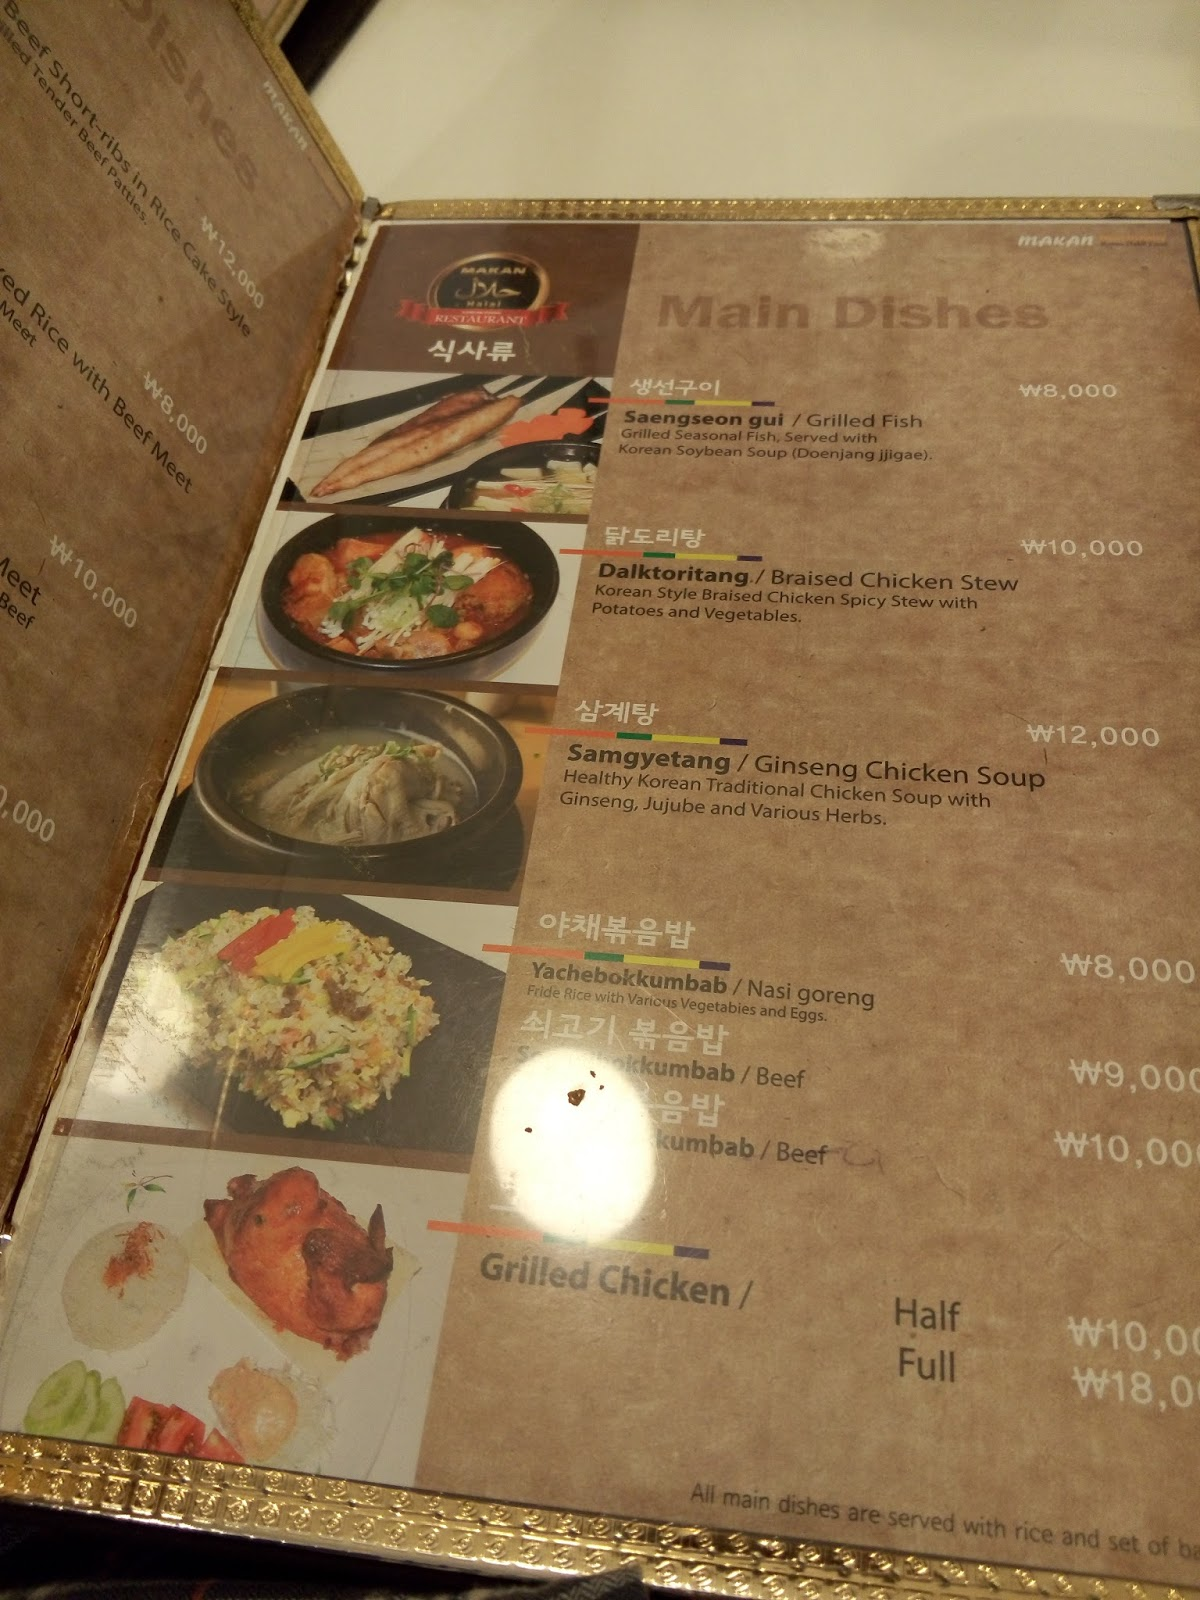 Eid Halal Korean Restaurant Tapi Tutup Tia Jua Every Monday So Kami Aga Lah Saja Arah One More Place Yang Famous Jua Kana Recommend Oleh Ramai Orang